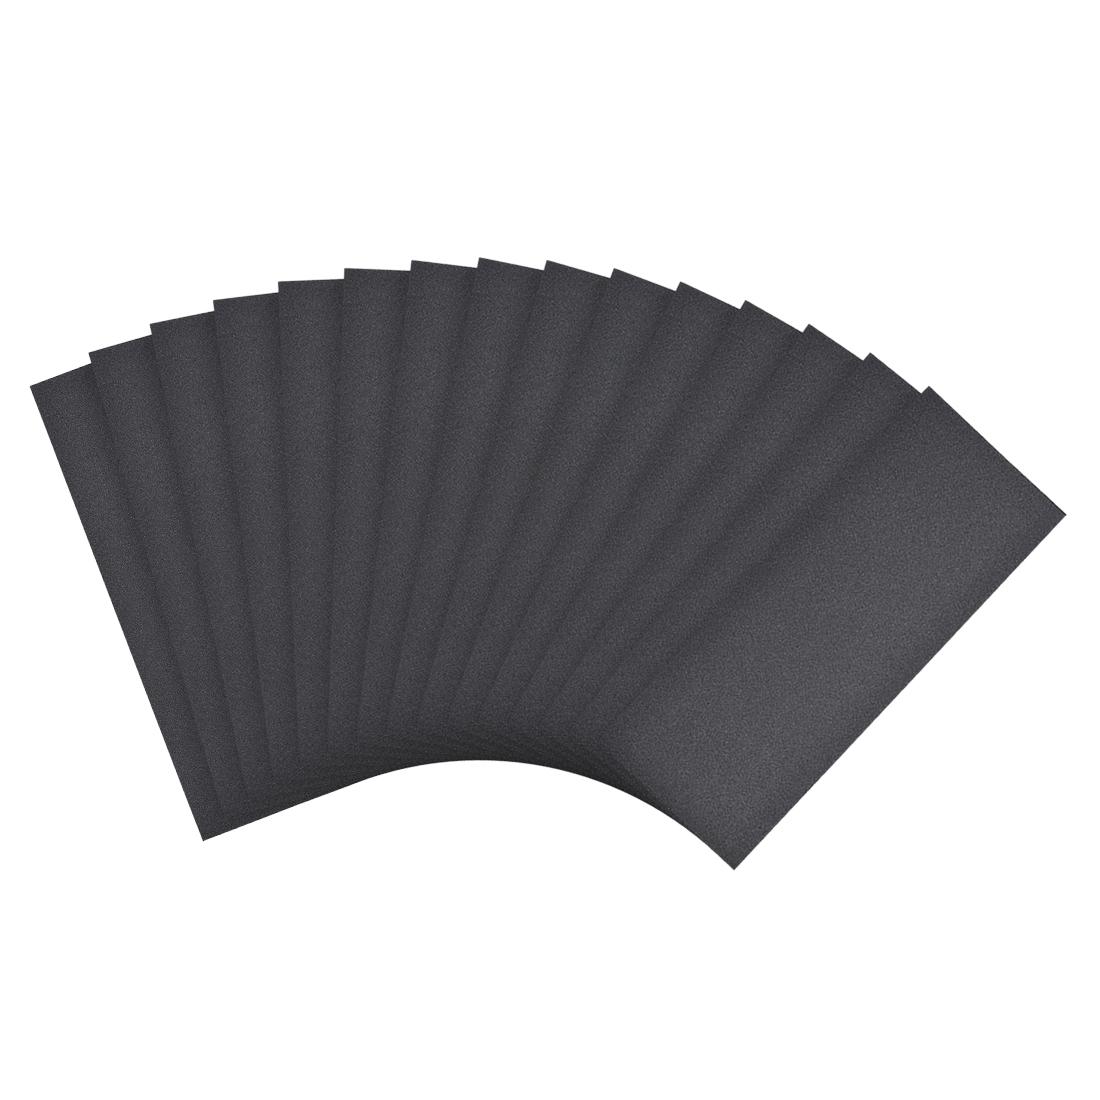 Waterproof Sandpaper, Wet Dry Sand Paper Grit of 320, 9 x 3.7inch 15pcs